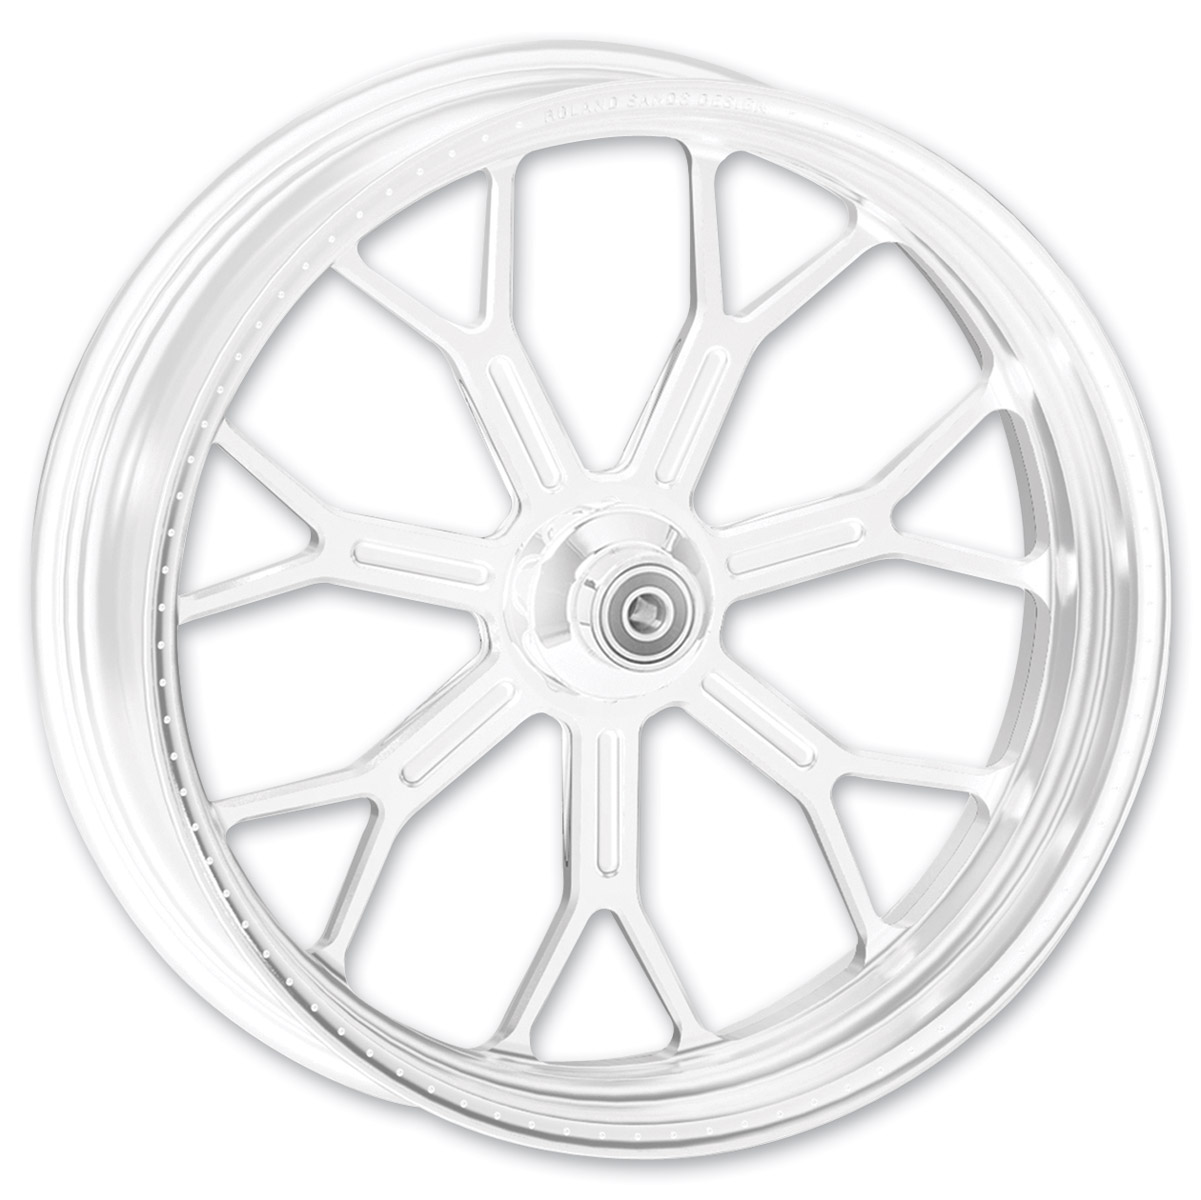 Roland Sands Design Del Mar Chrome Rear Wheel, 17